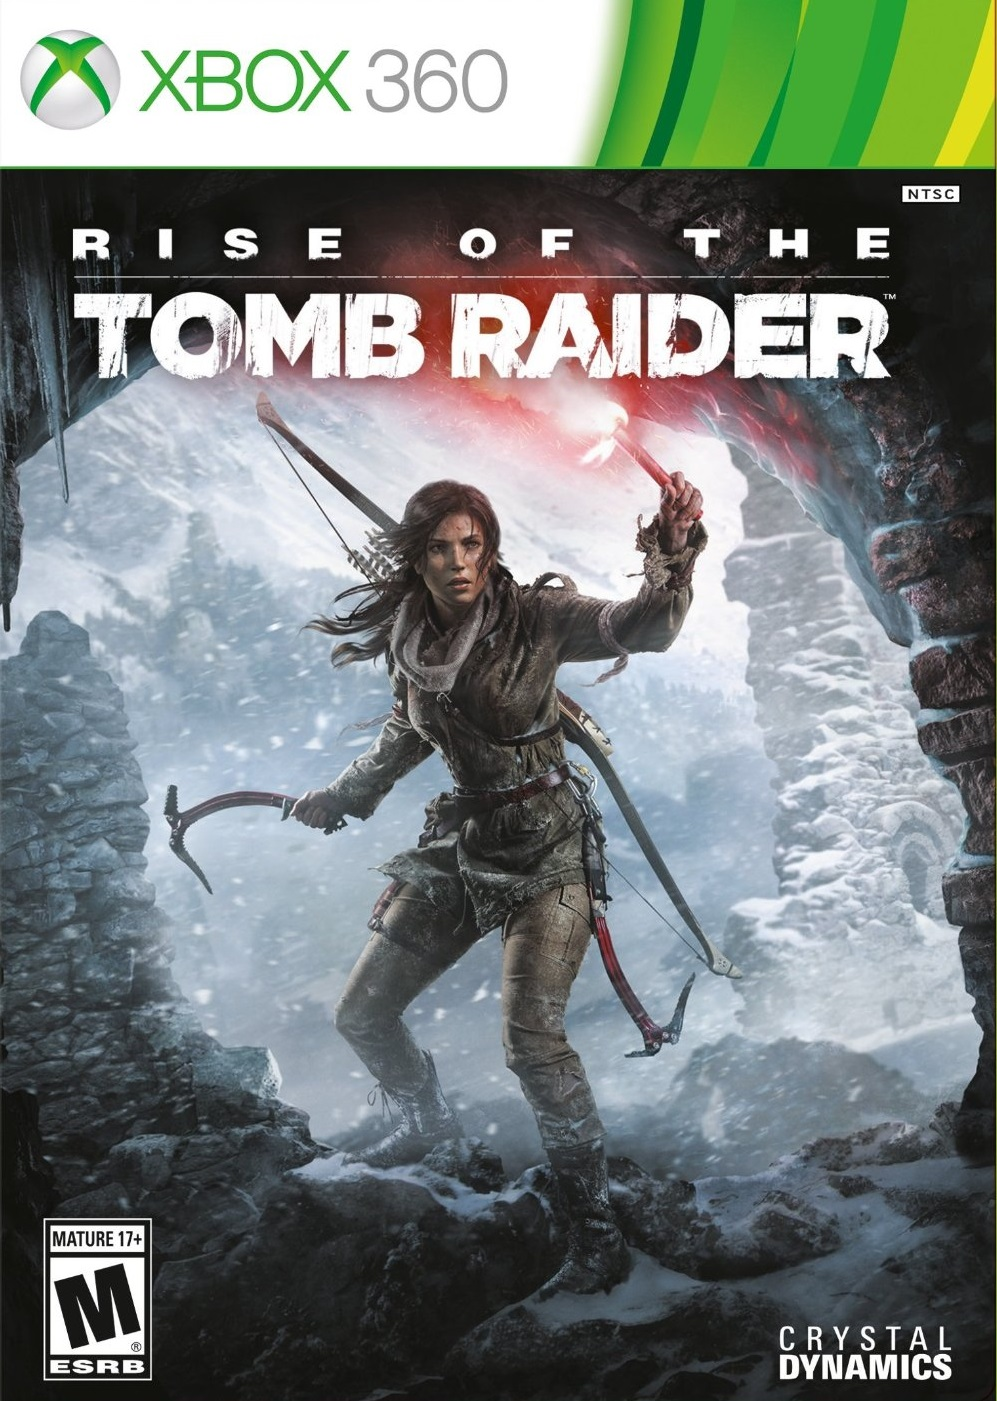 Rise Of The Tomb Raider ESPAÑOL XBOX 360 Cover Caratula